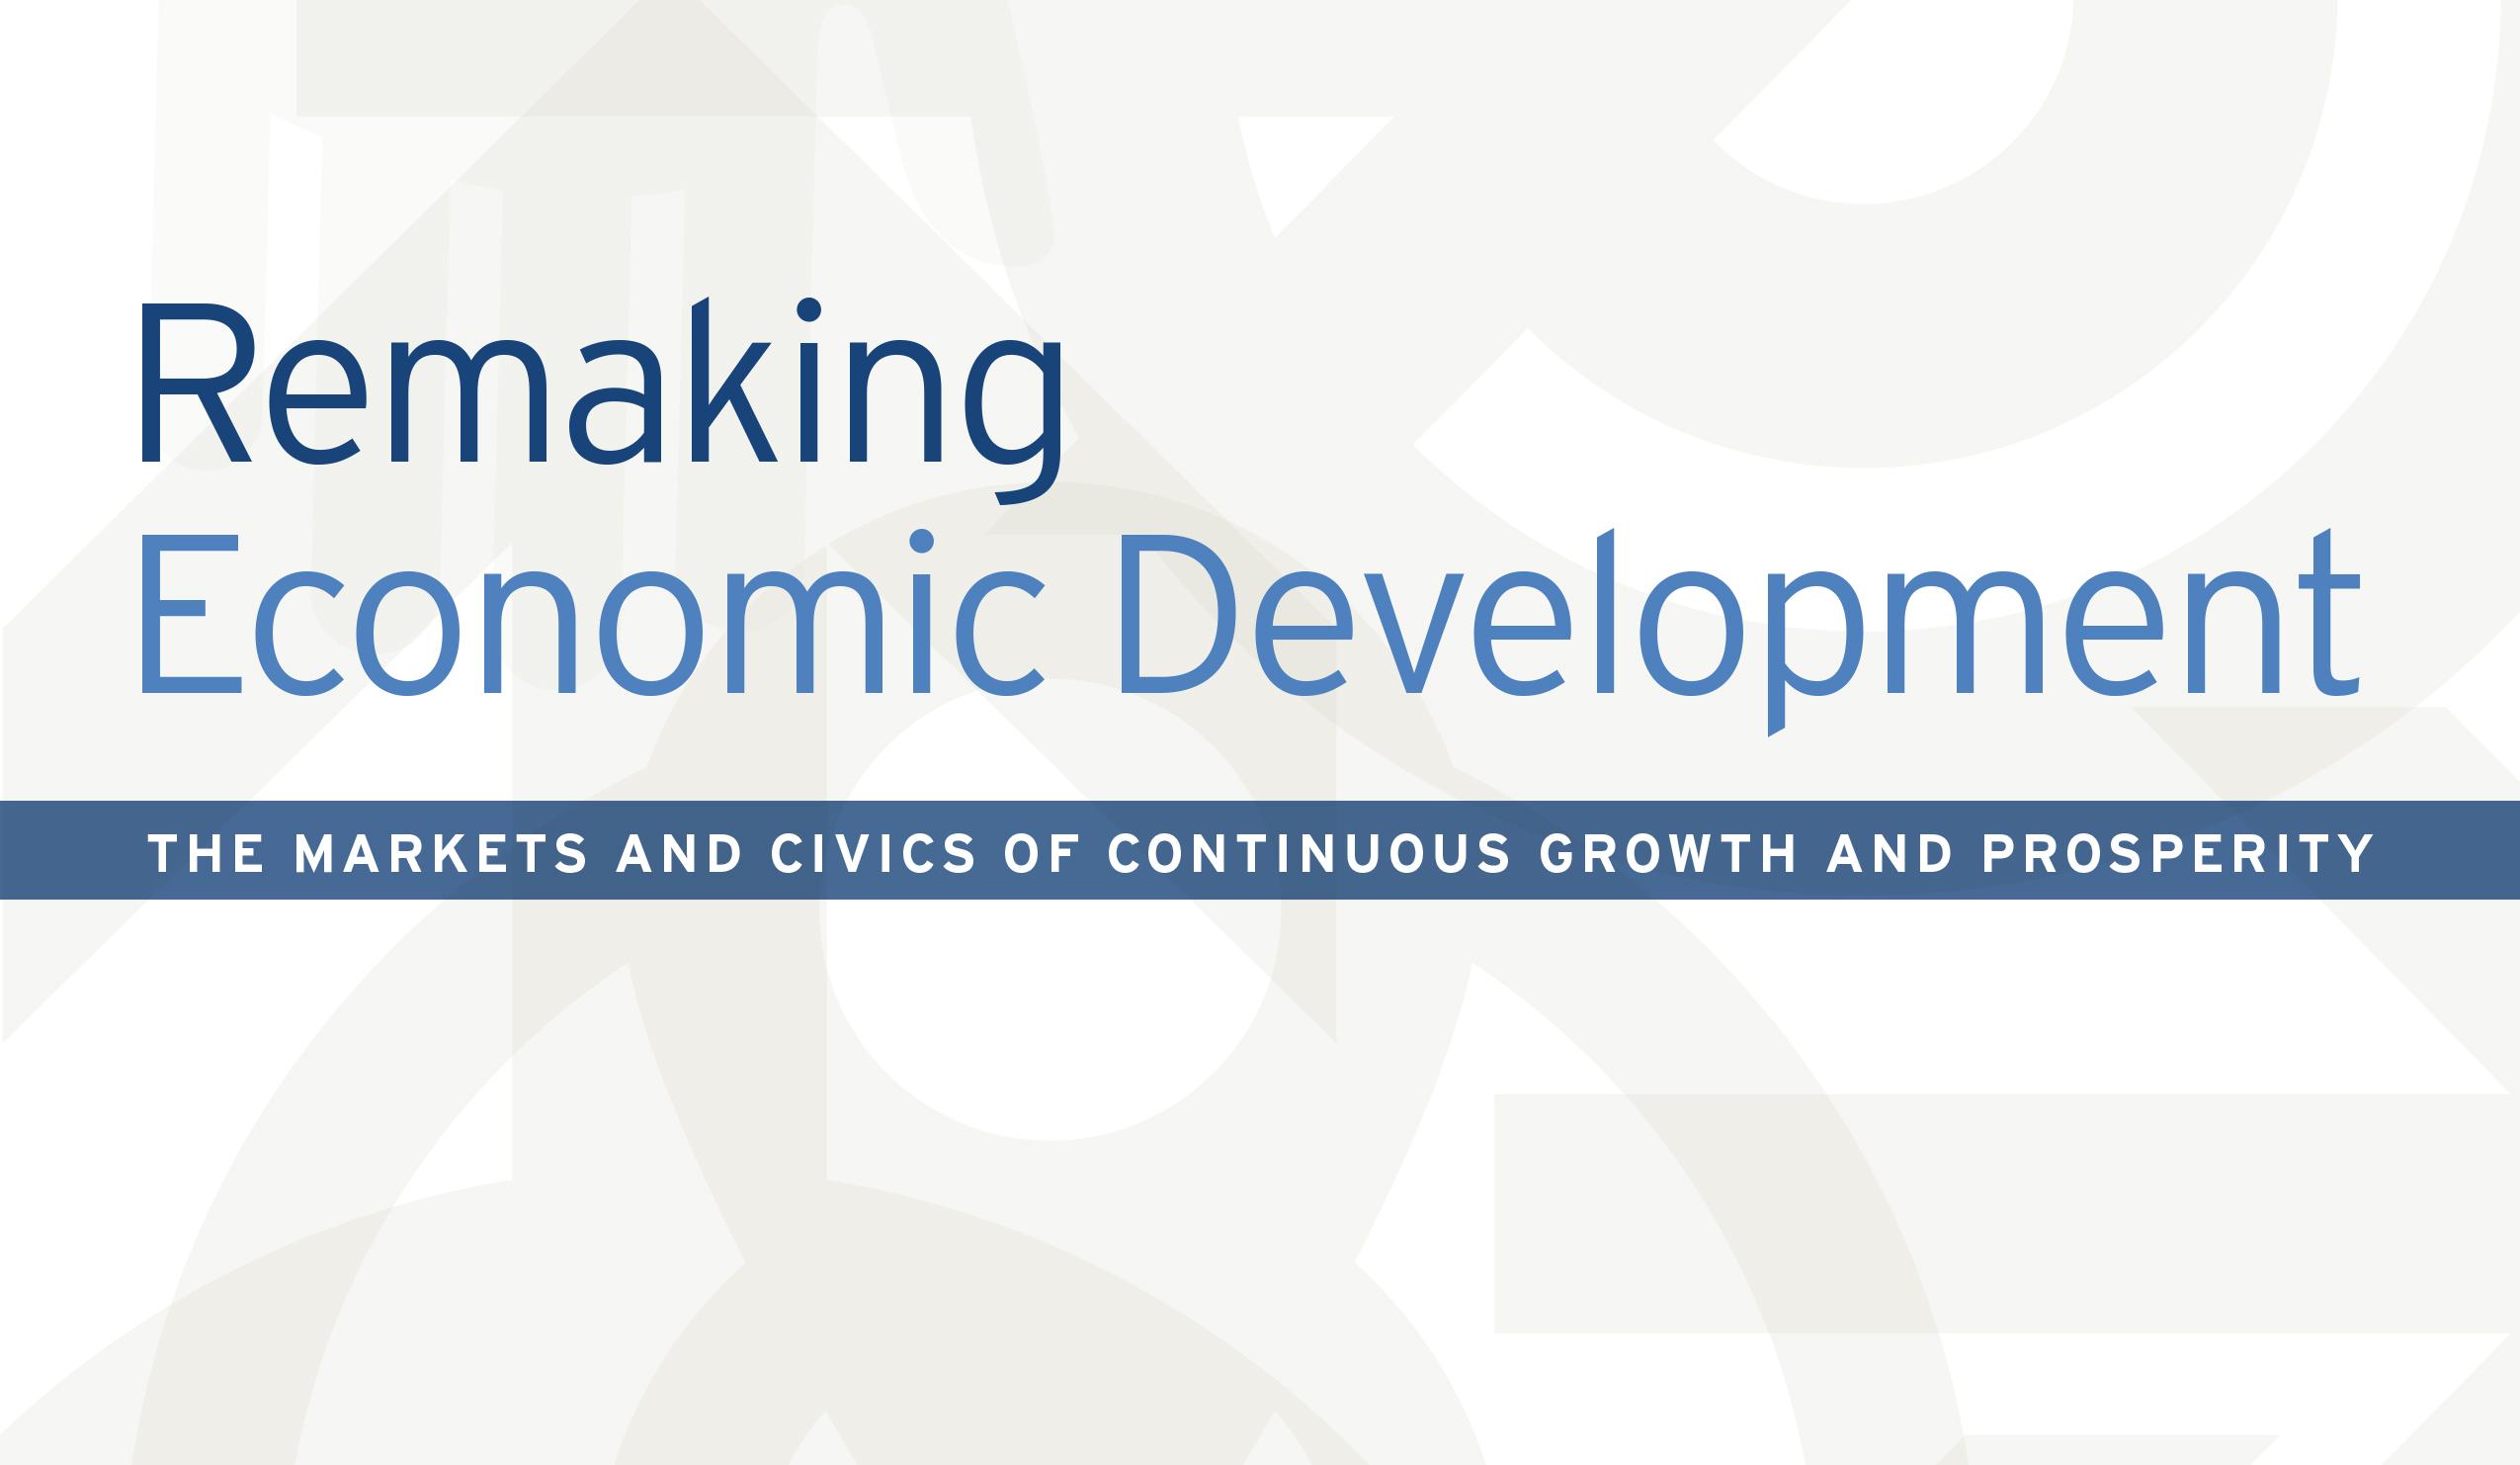 Remaking economic development: The markets and civics of ...